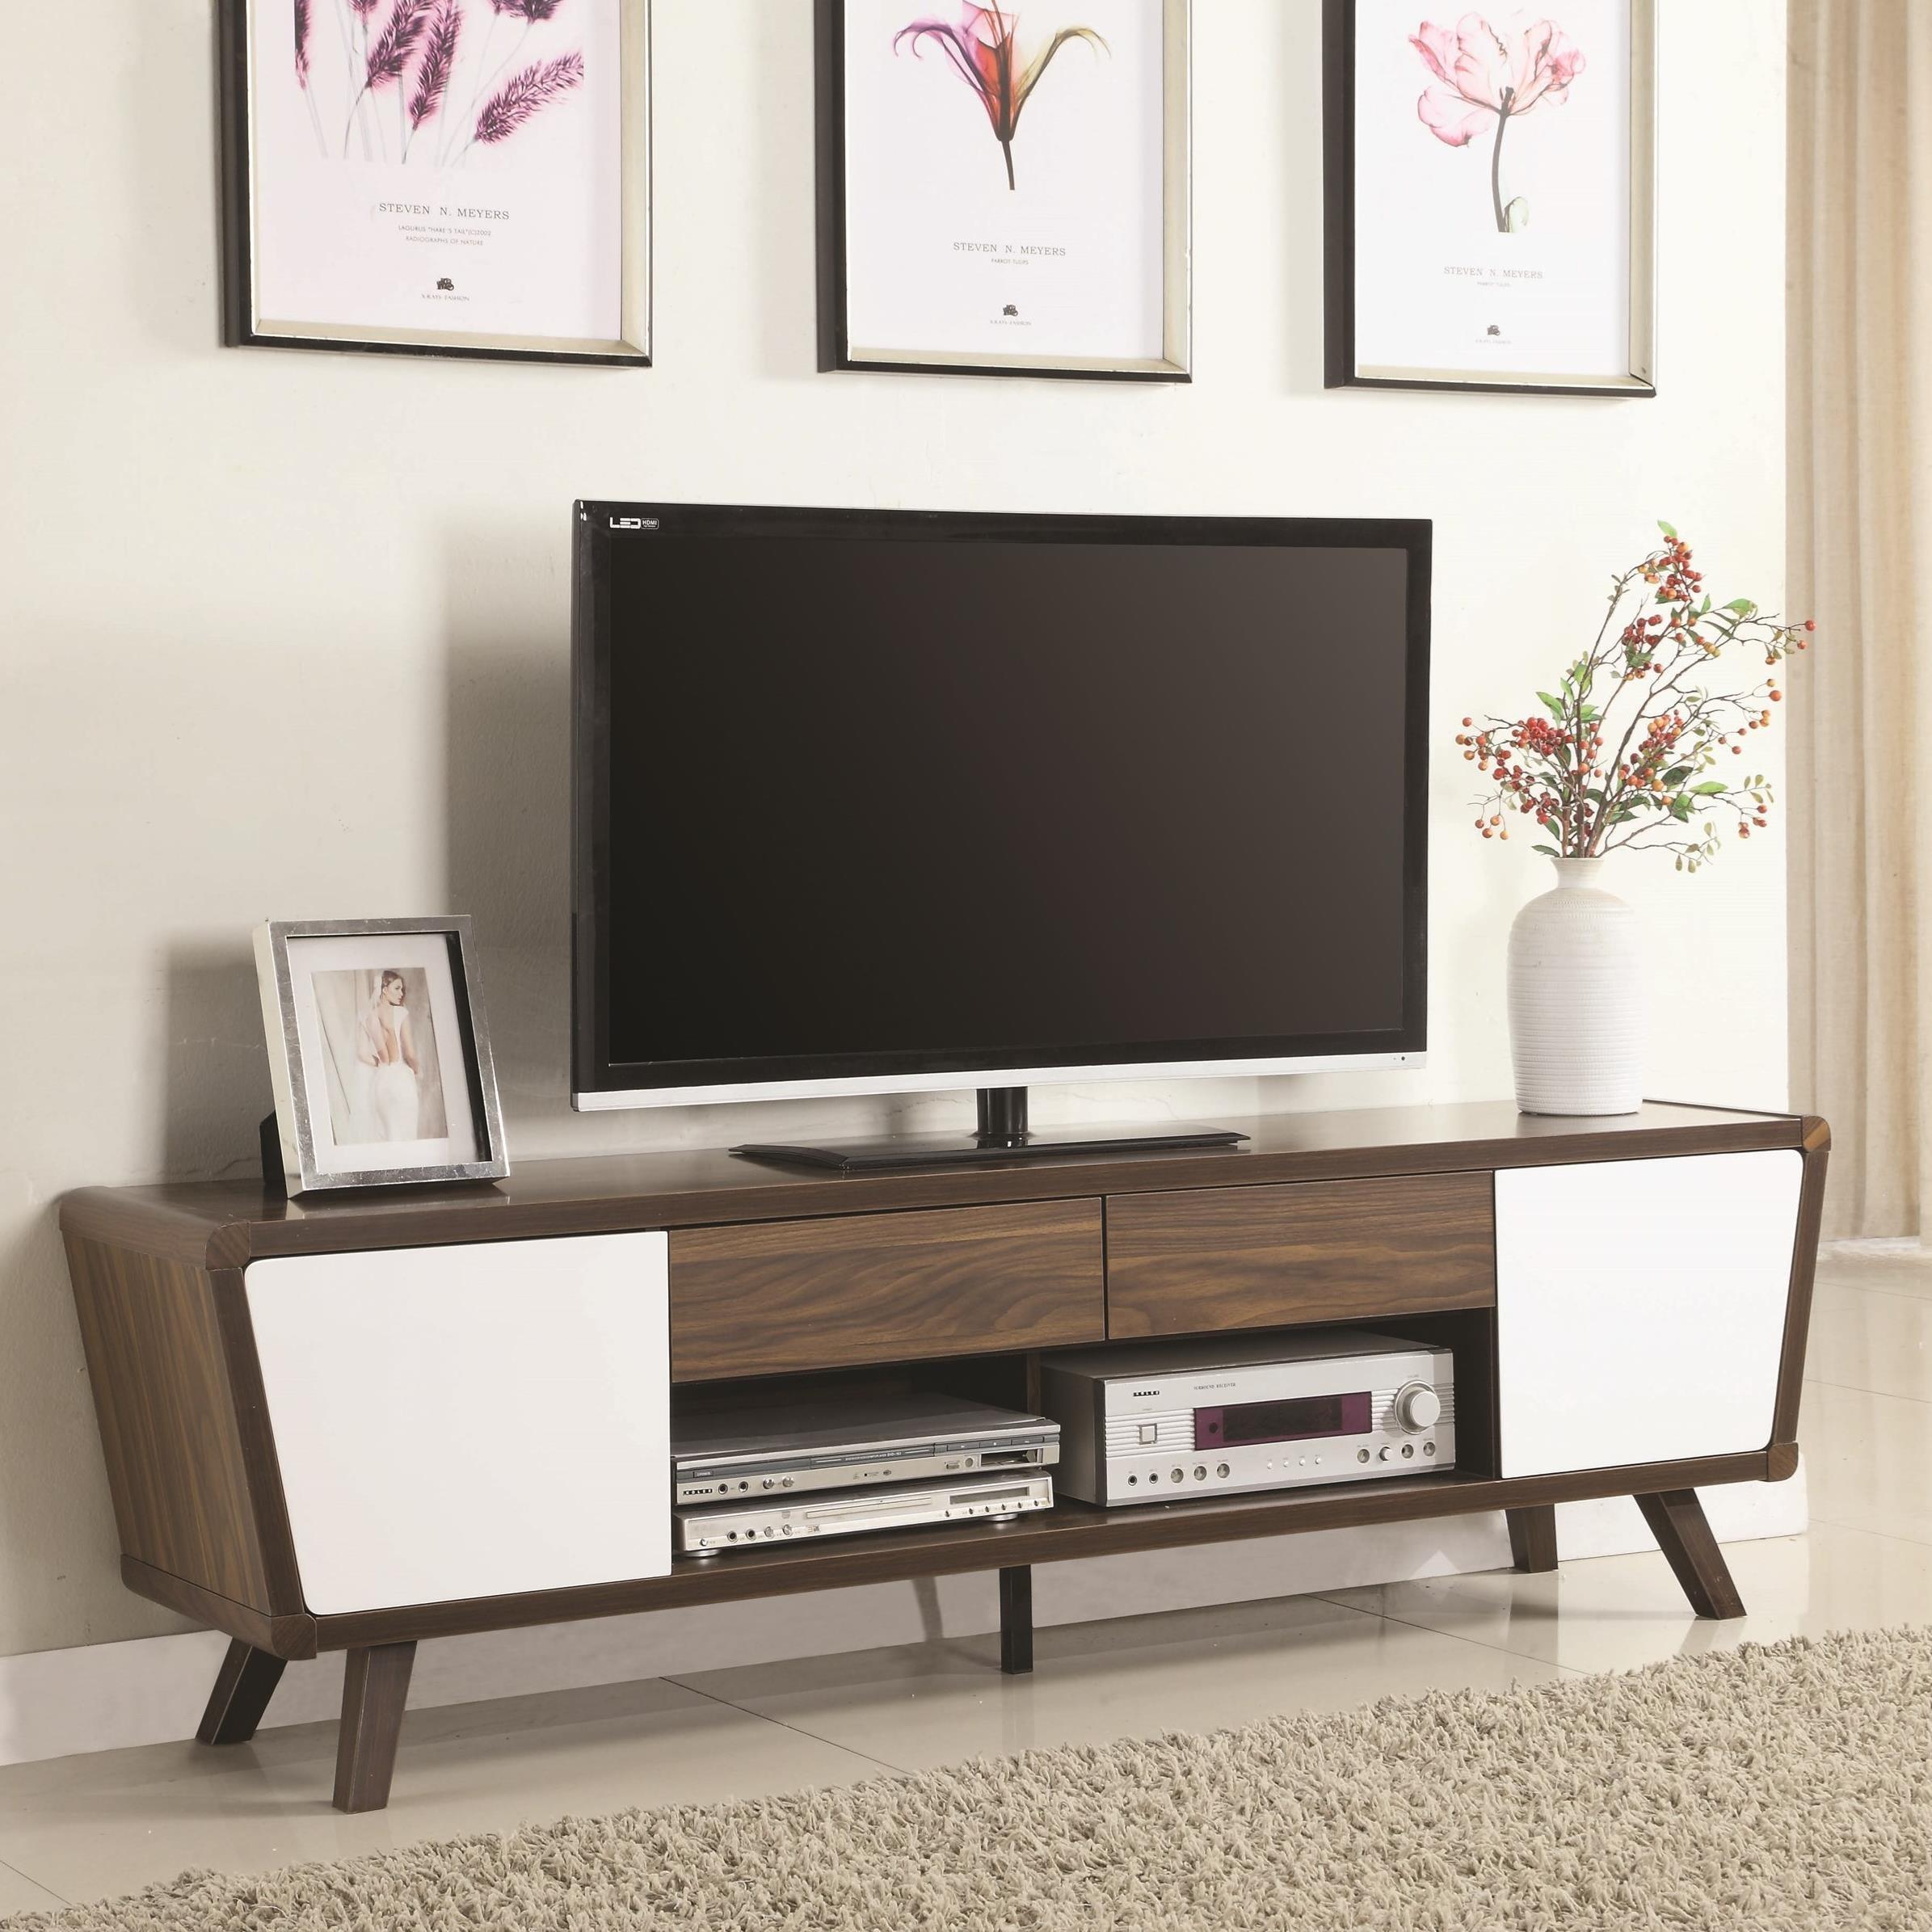 Danish Modern Tv Credenza : Ft larsen teak tv credenza sideboard mid century modern